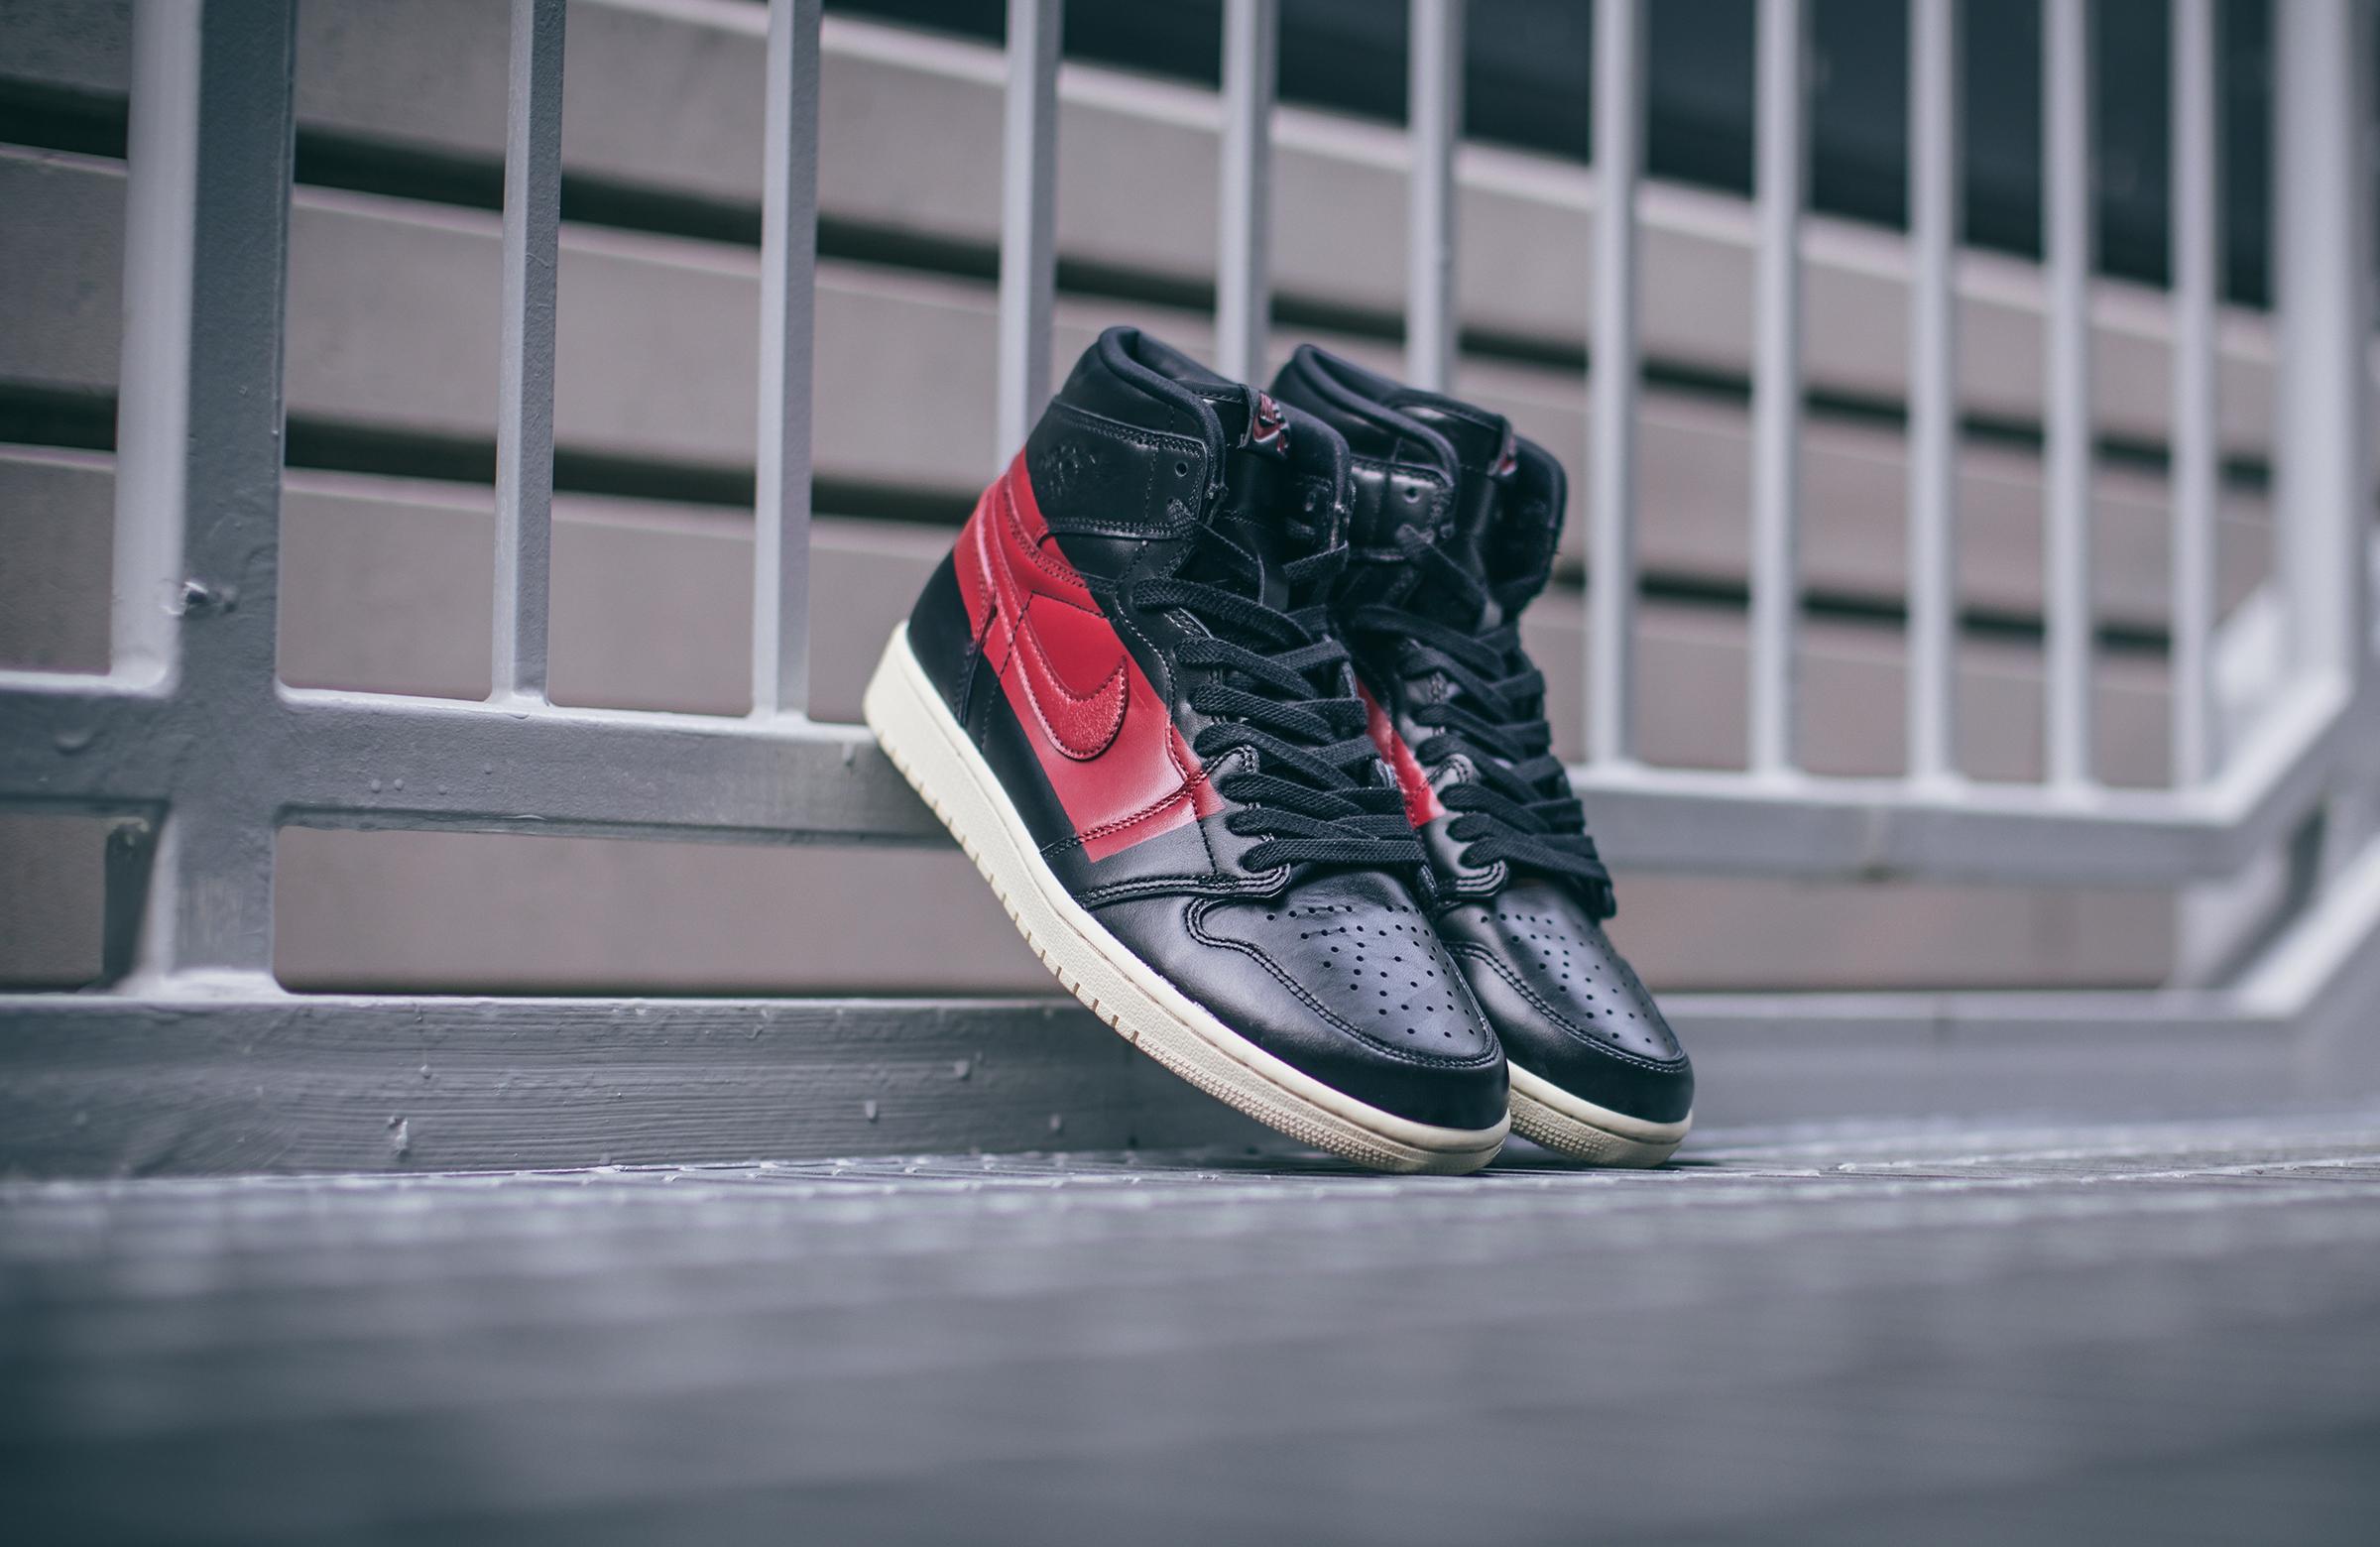 Air-Jordan-1-High-Defiant-Couture-BlackGym-Red-3.jpg